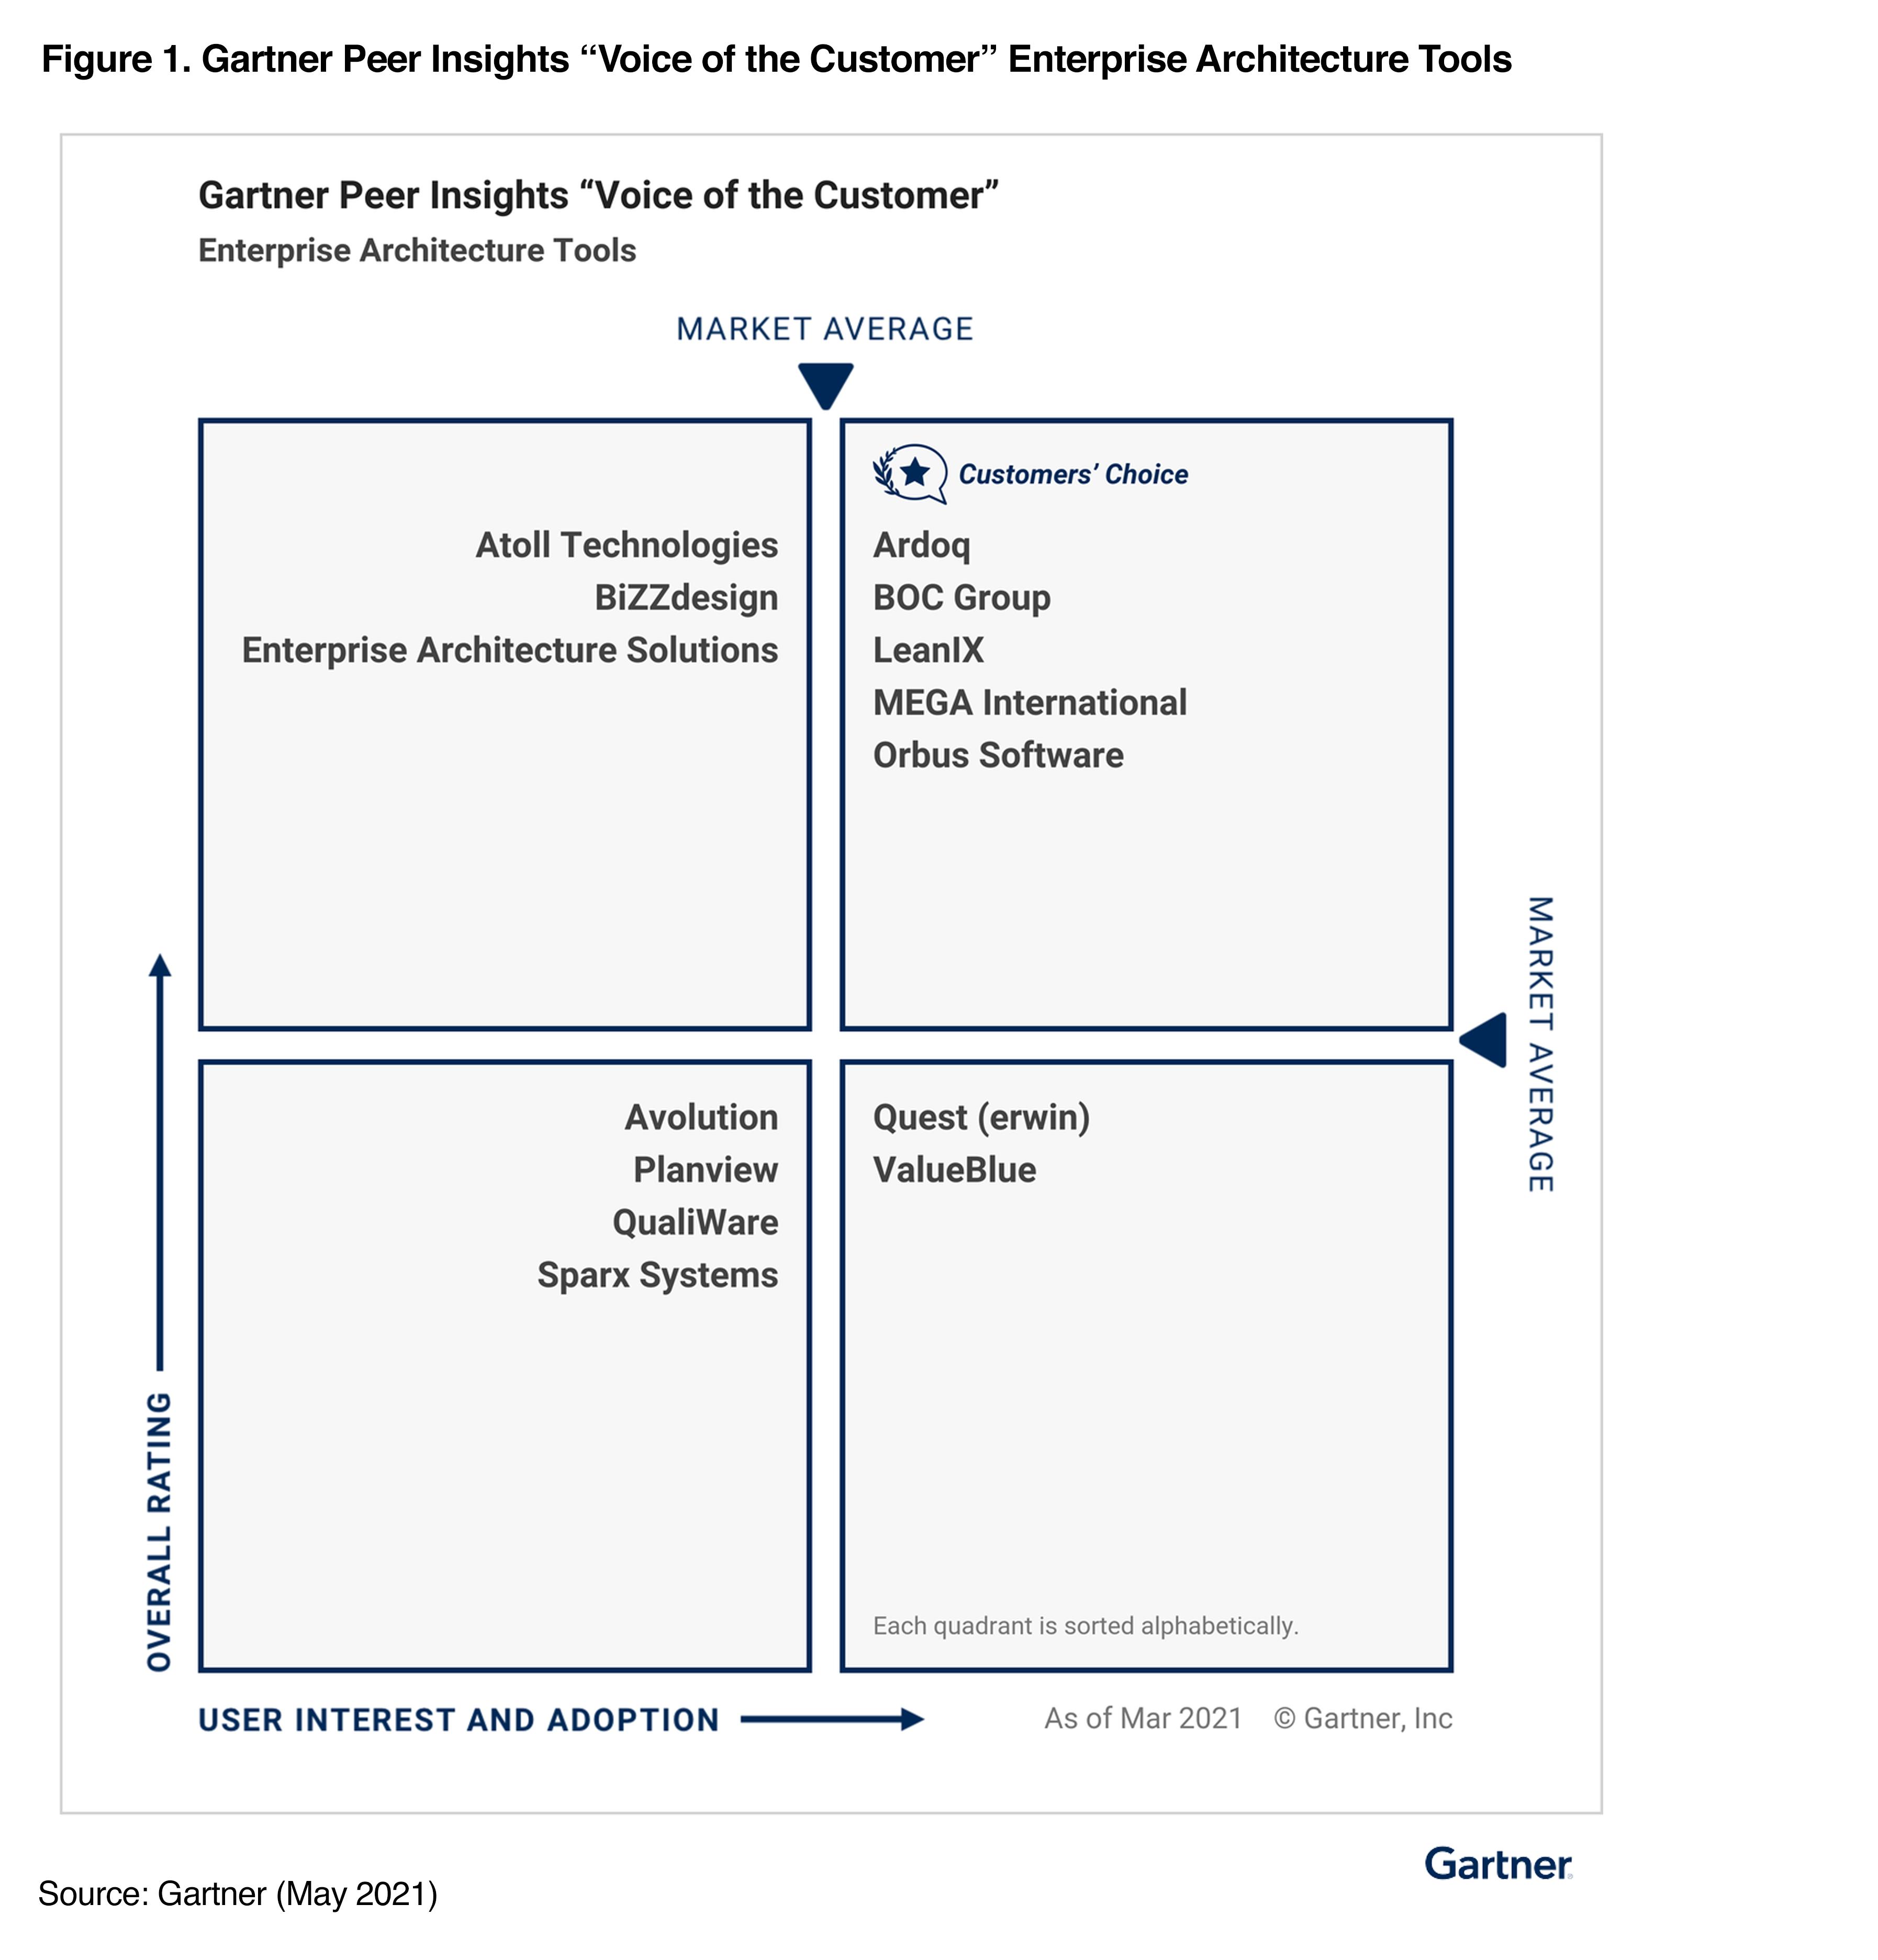 gartner peer insights voice of the customer enterprise architecture tools